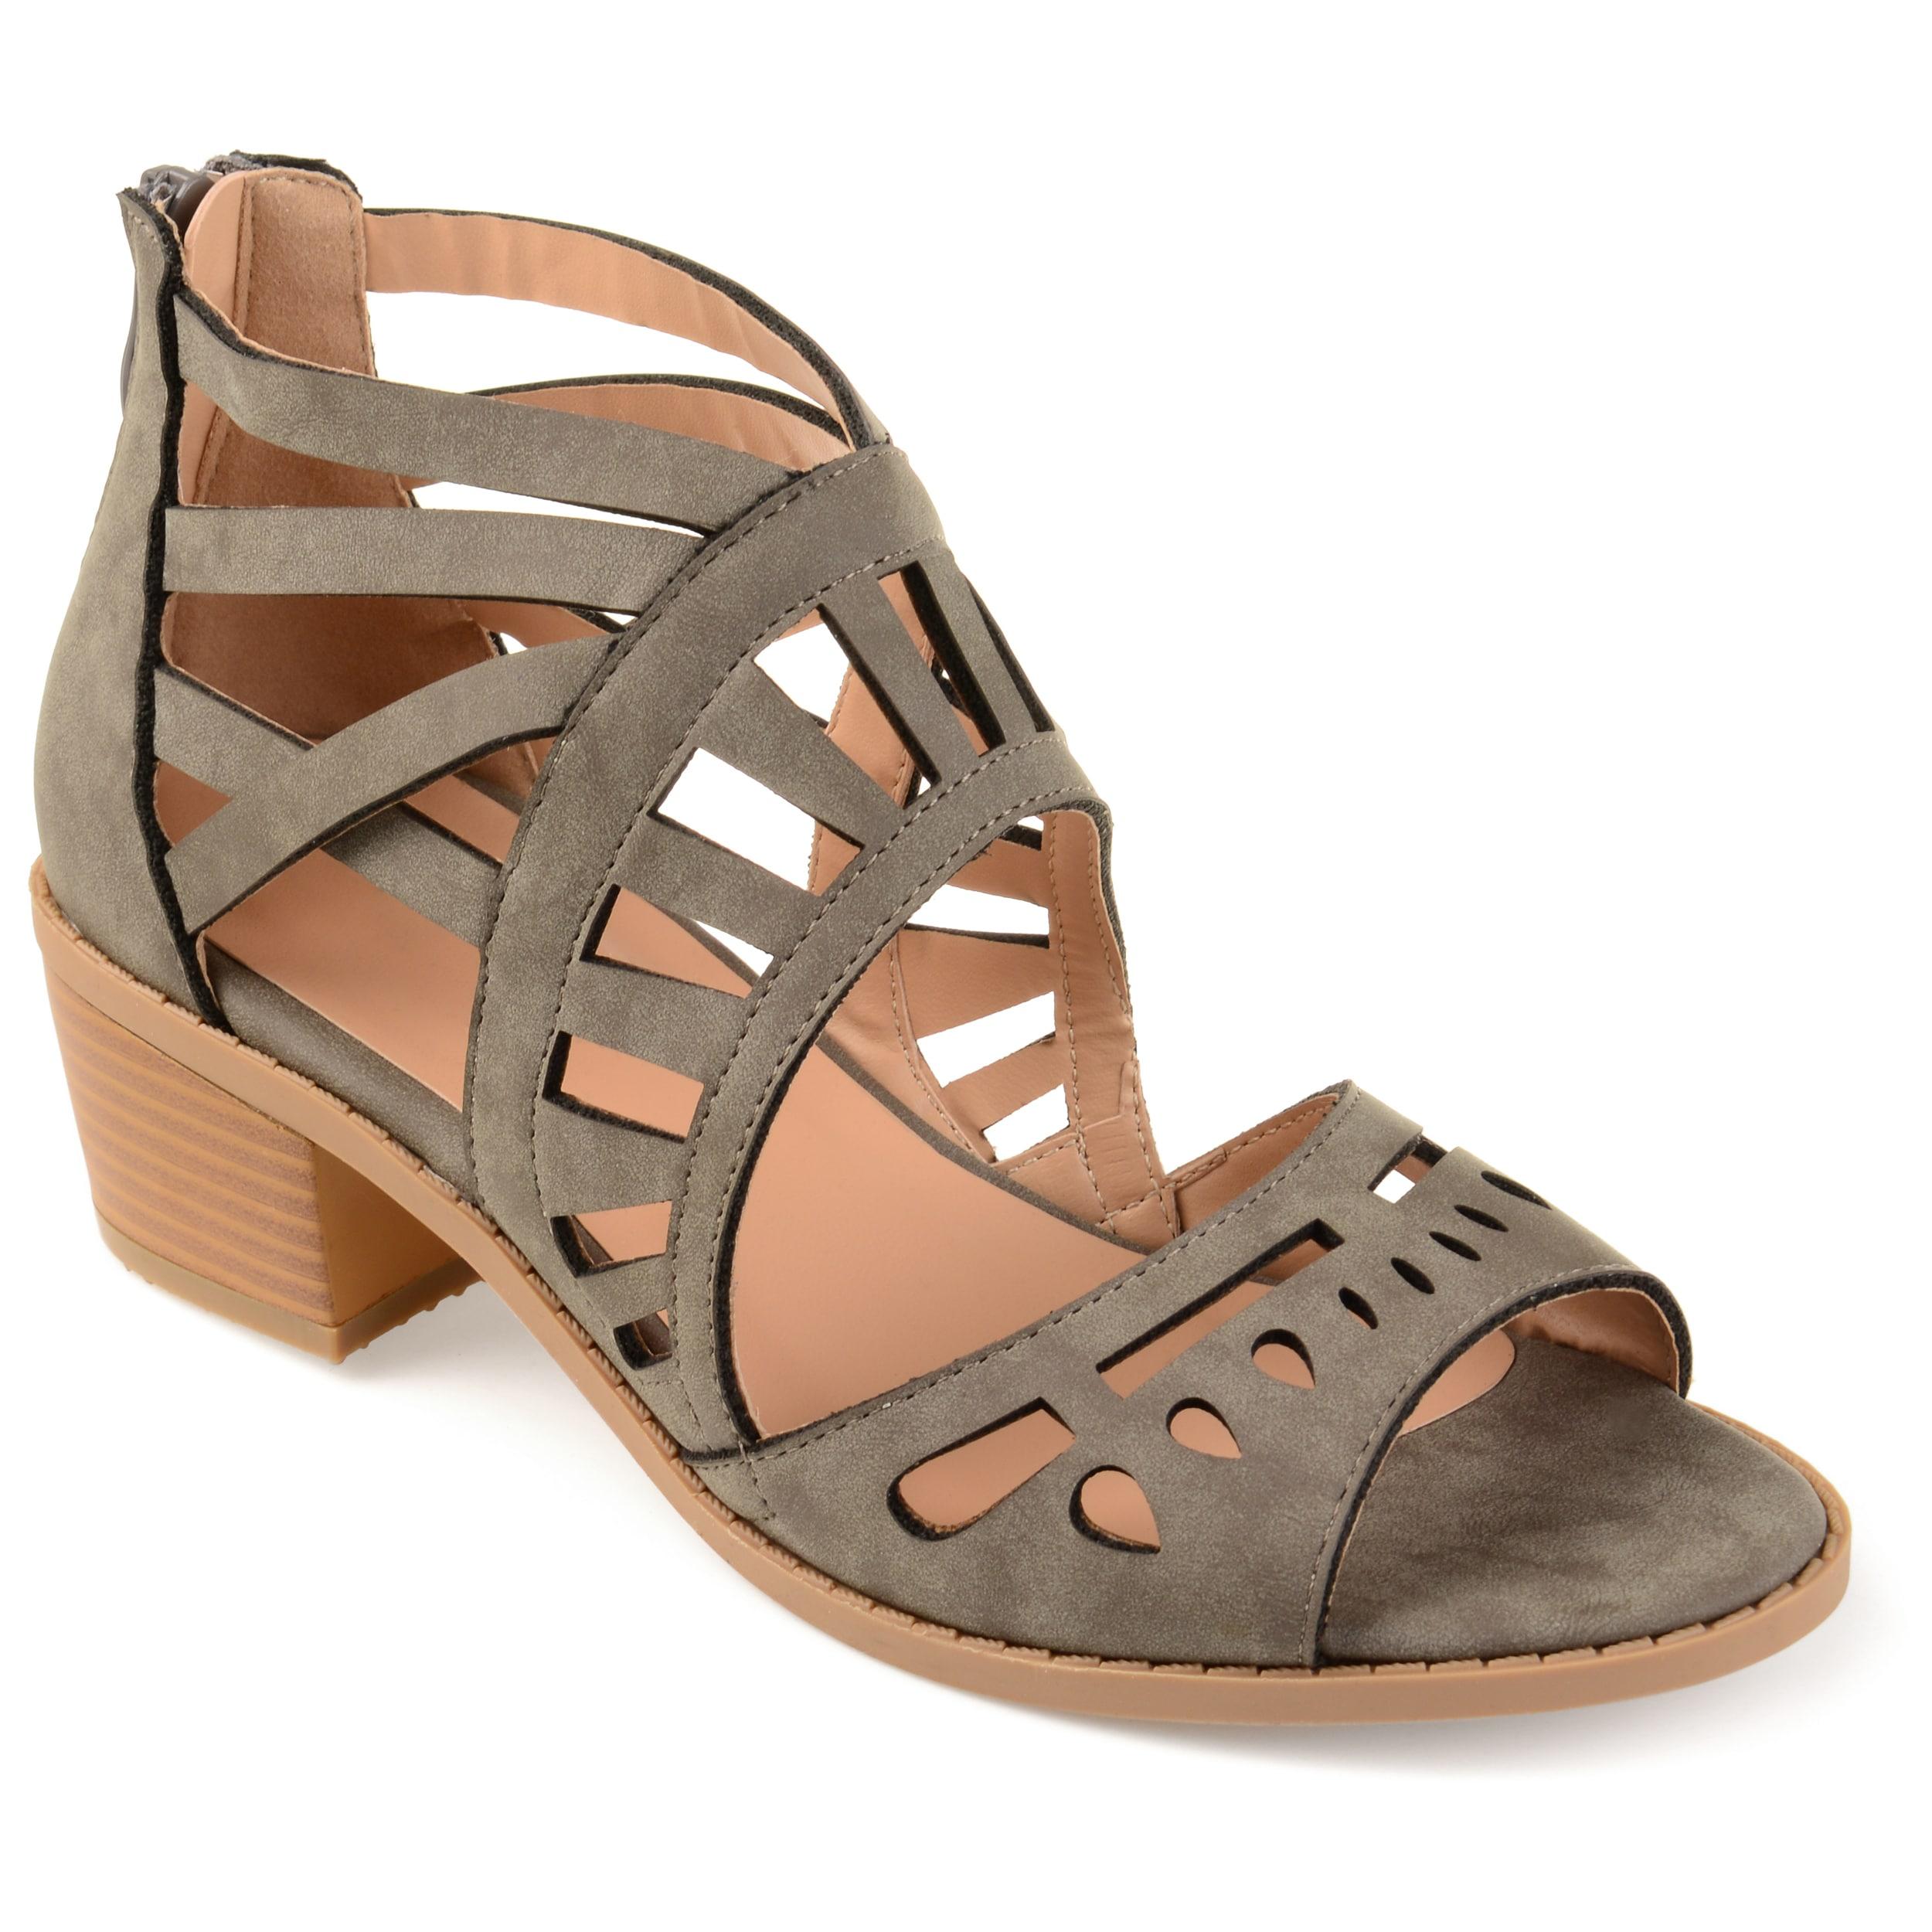 d1e893243db Journee Collection Women s  Dexy  Open-toe Faux Nubuck Laser-cut Sandals